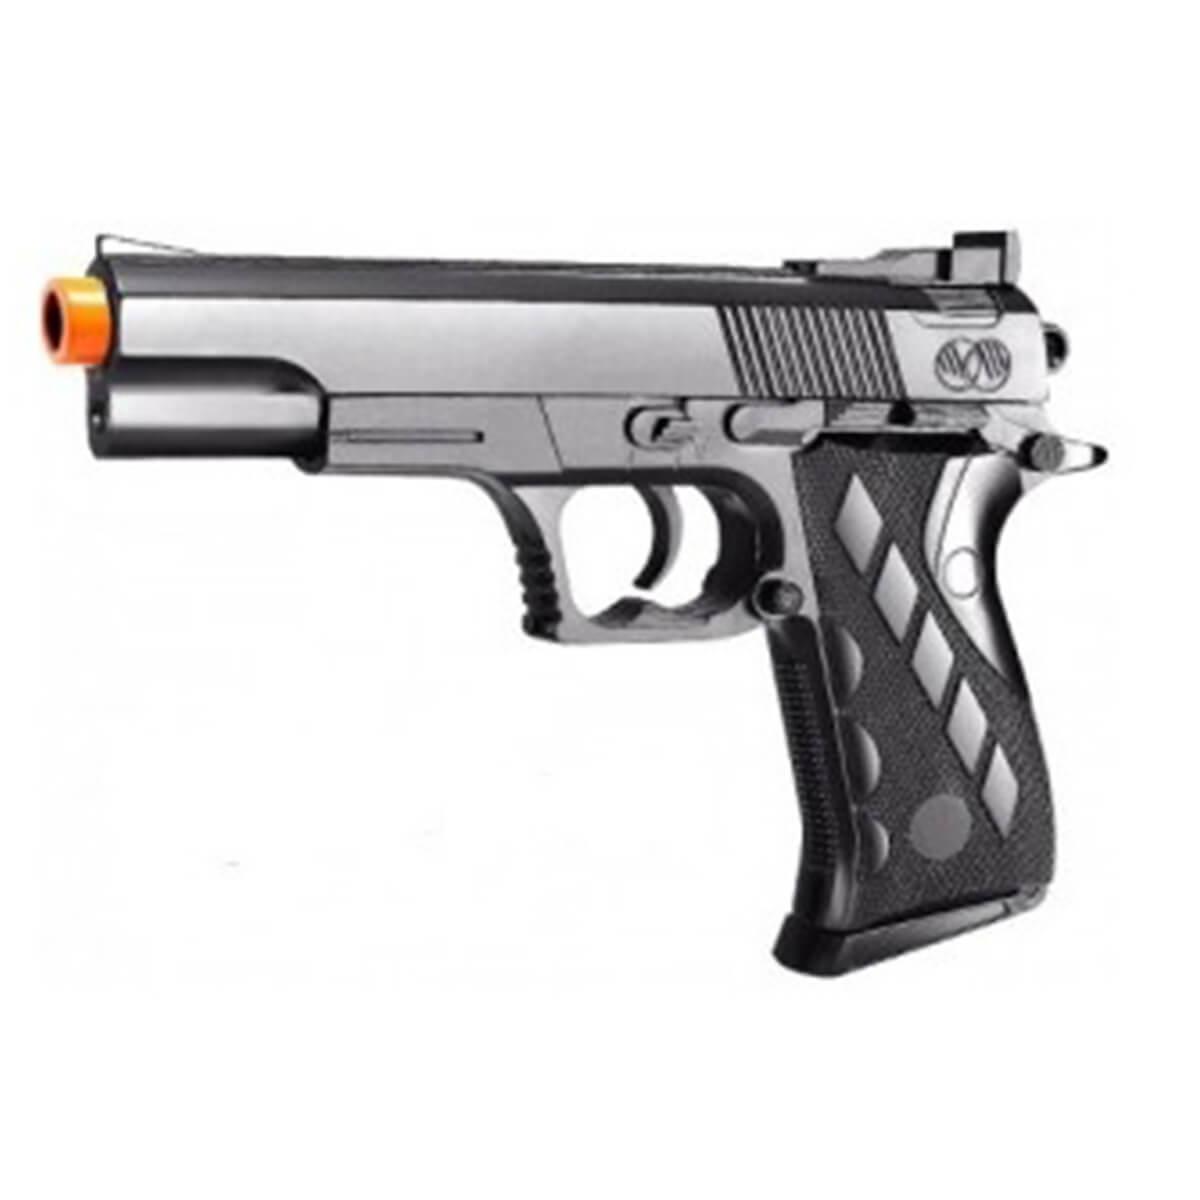 Pistola de Airsoft VG 1911SW-2122A1 Spring 6mm